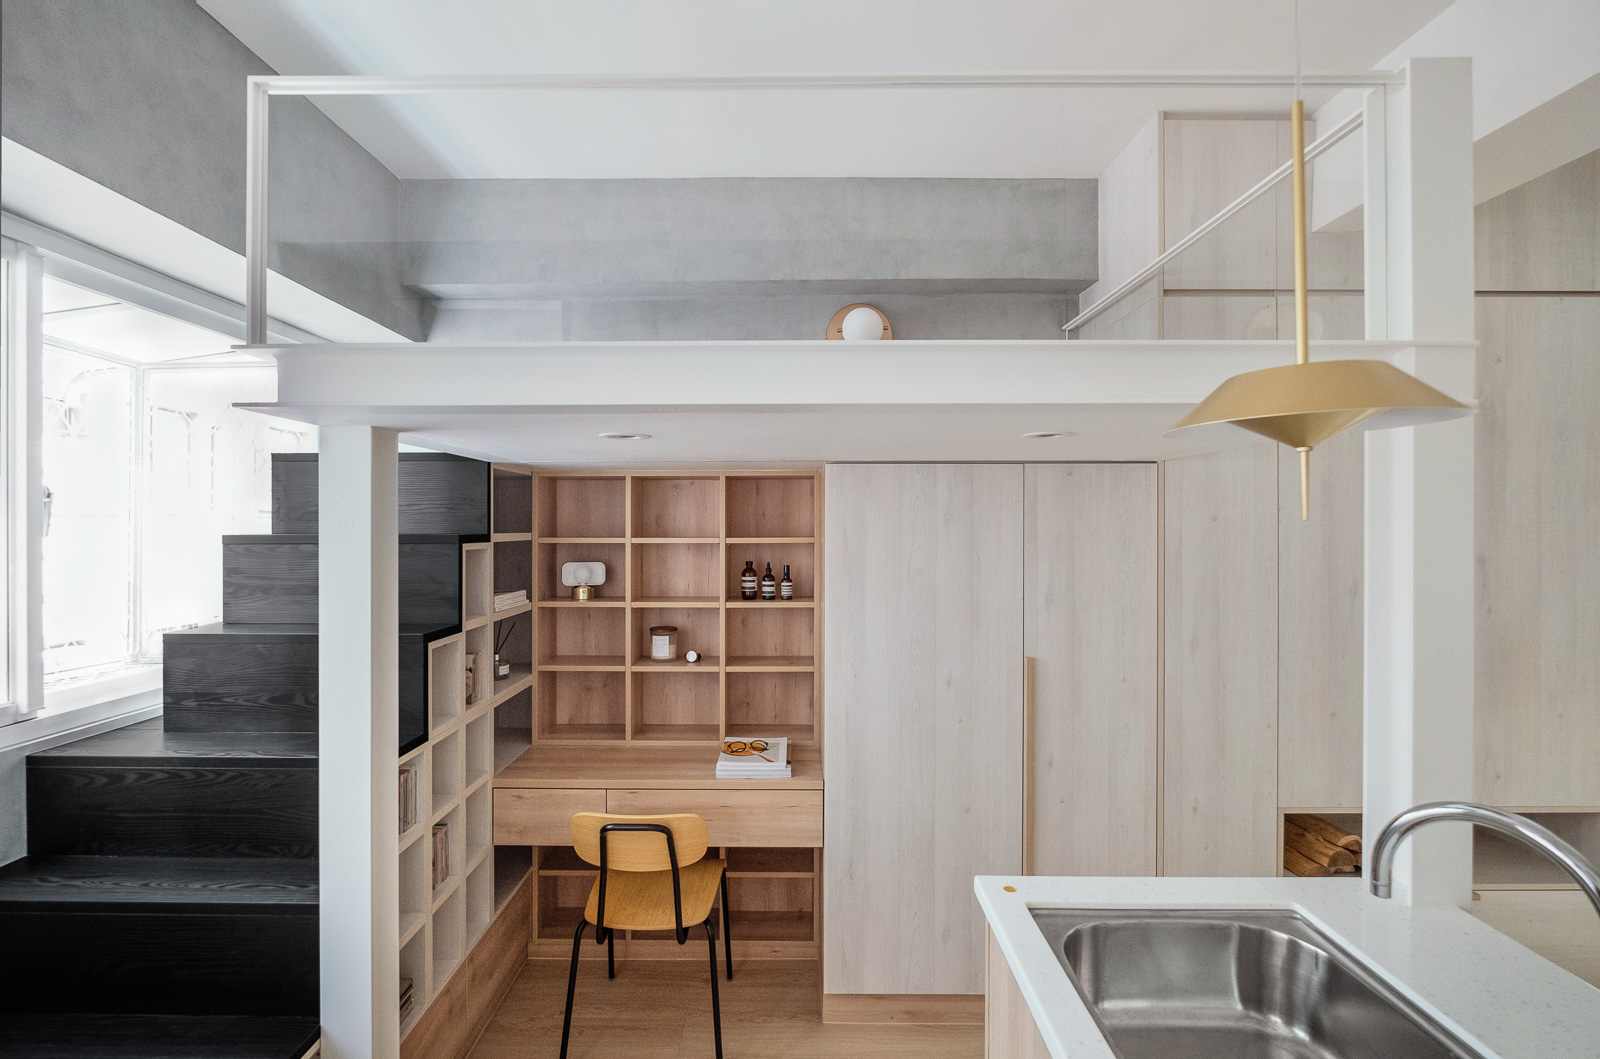 NestSpace_SmallHouse_F-016